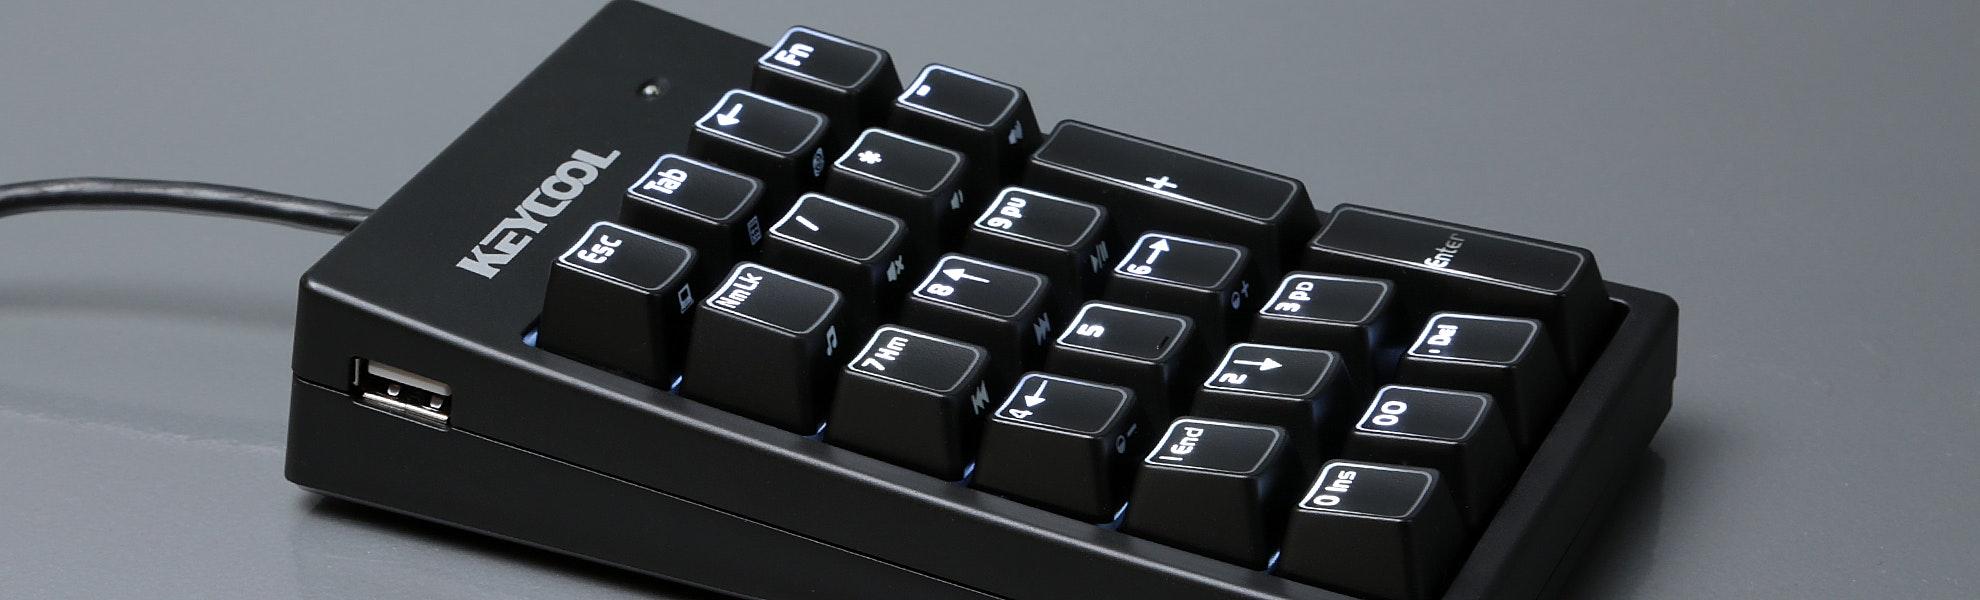 KEYCOOL 22-Key Numeric Mechanical Keypad